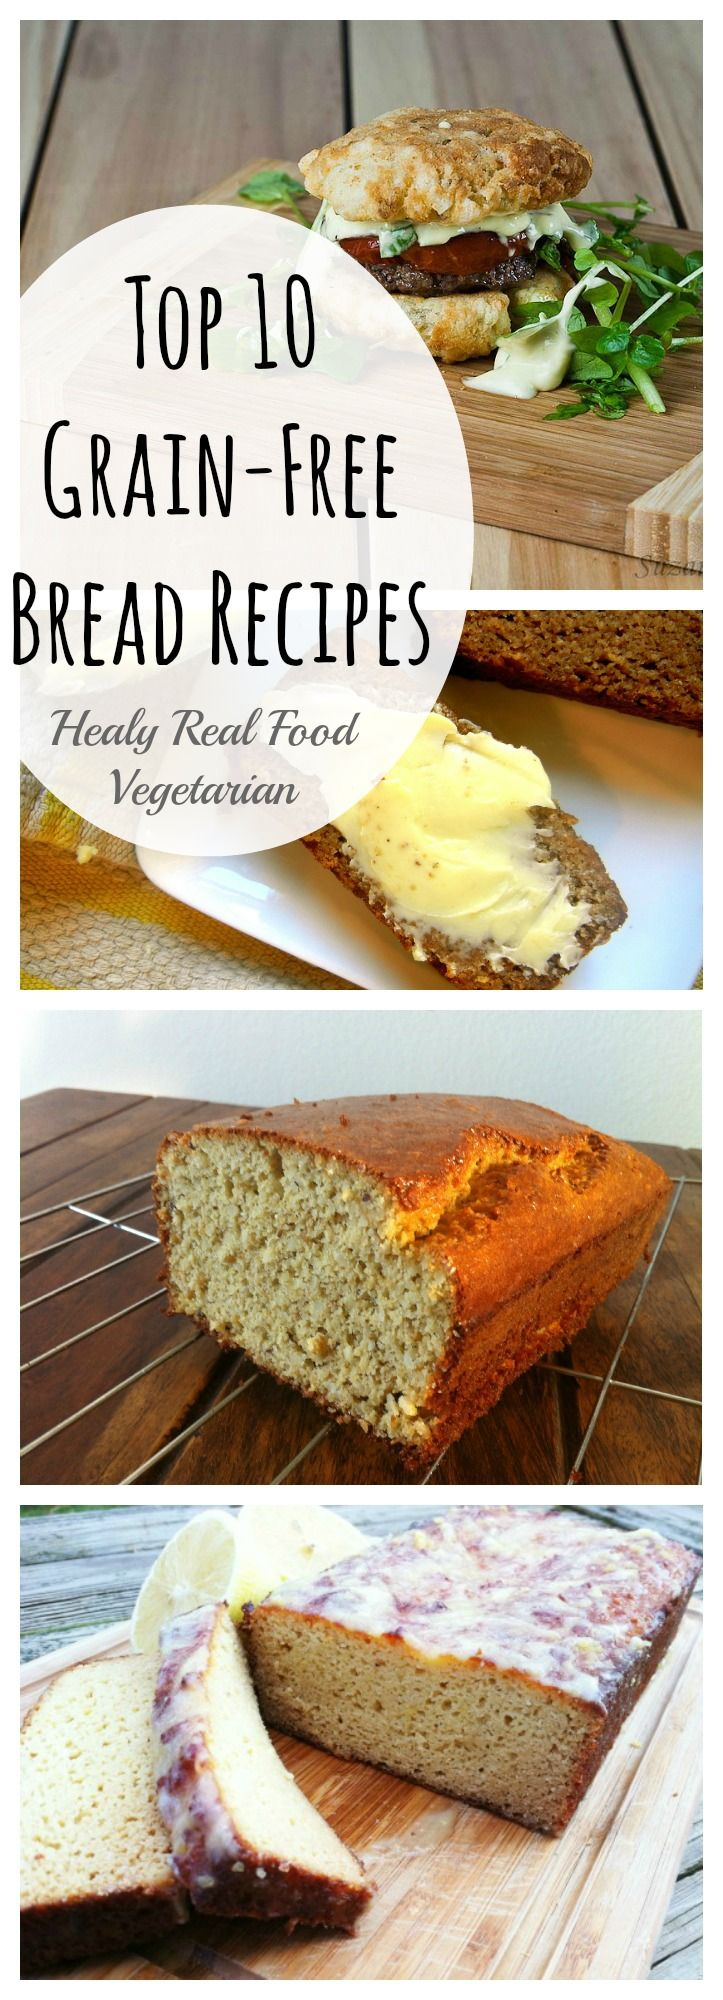 Top 10 Grain-Free Bread Recipes @ Healy Eats Real